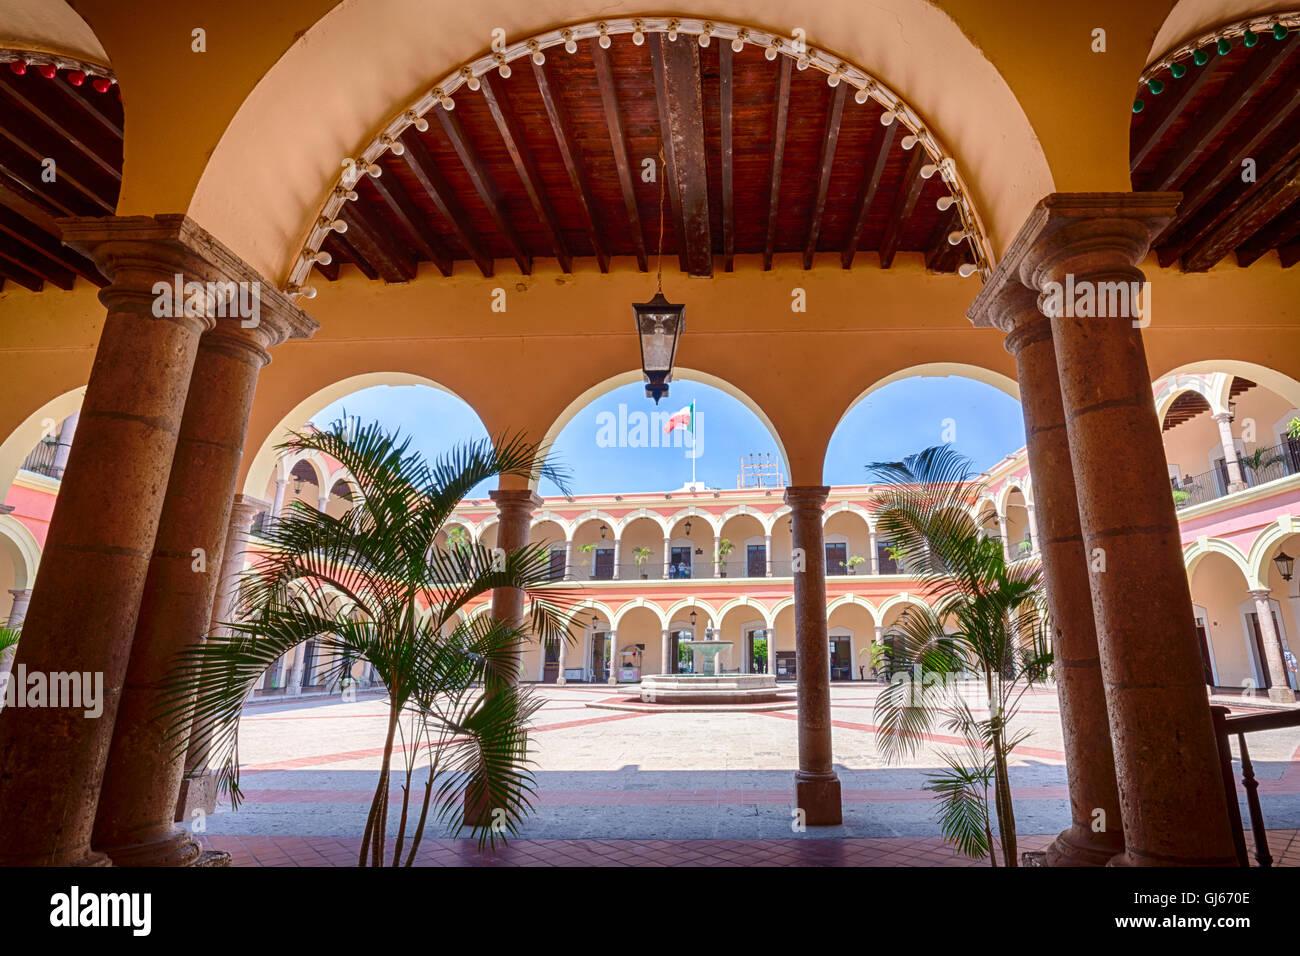 Die kolonialen Regierungspalast von El Fuerte, Sinaloa, Mexiko. Stockbild